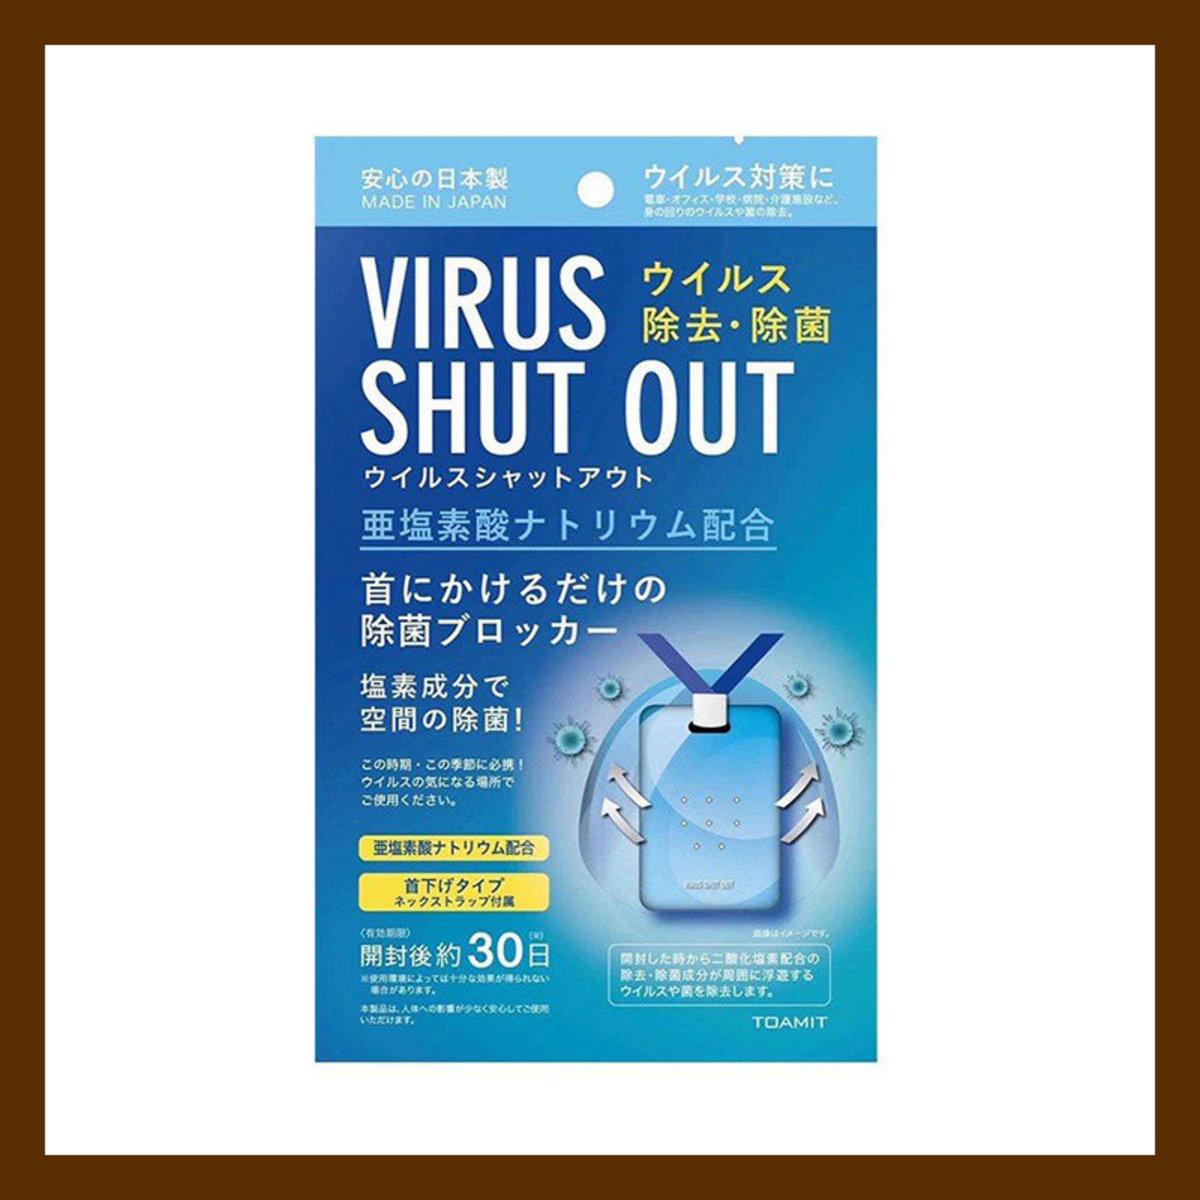 TOAMIT Virus Shut Out 抗菌消毒隨身掛片(4562441906380)